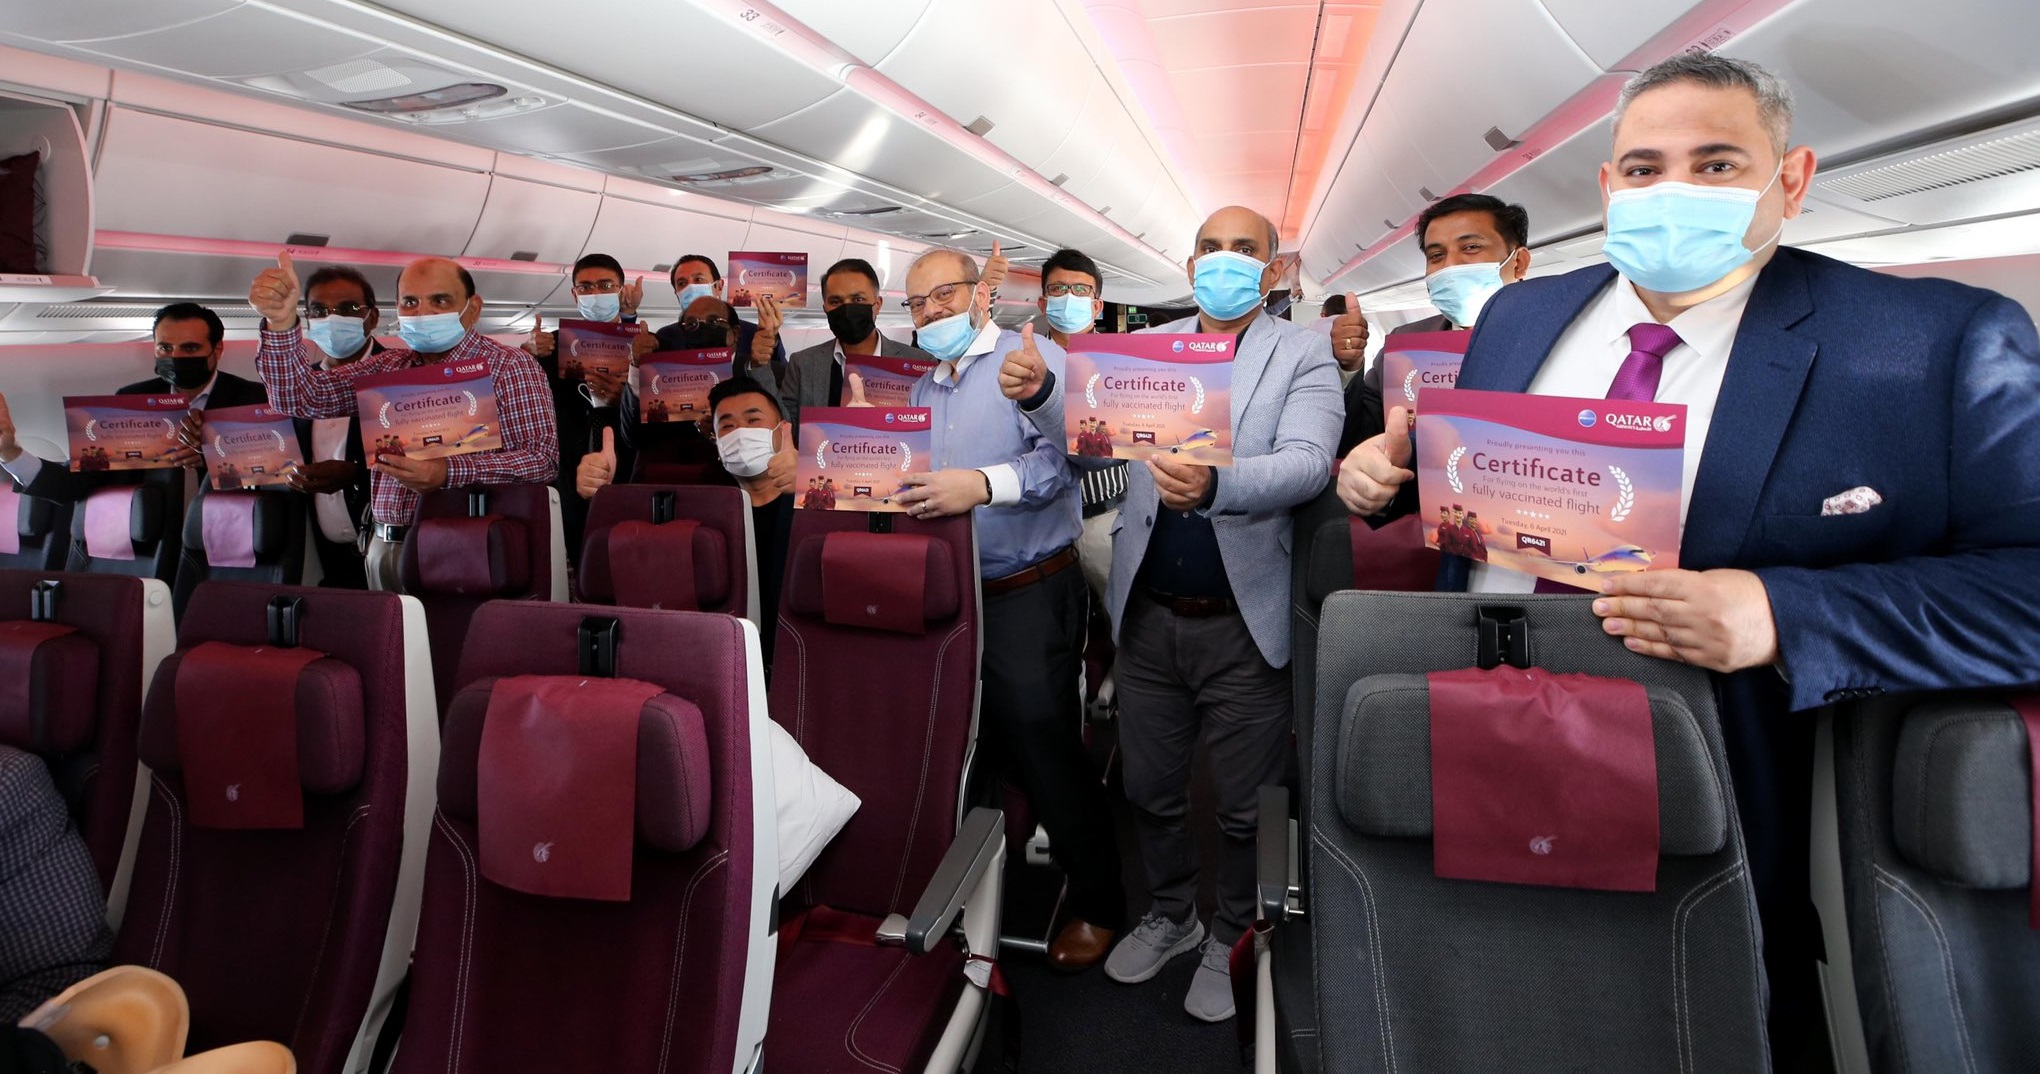 Primul zbor din lume destinat exclusiv pasagerilor vaccinați anti-Covid a decolat de la Doha, Qatar